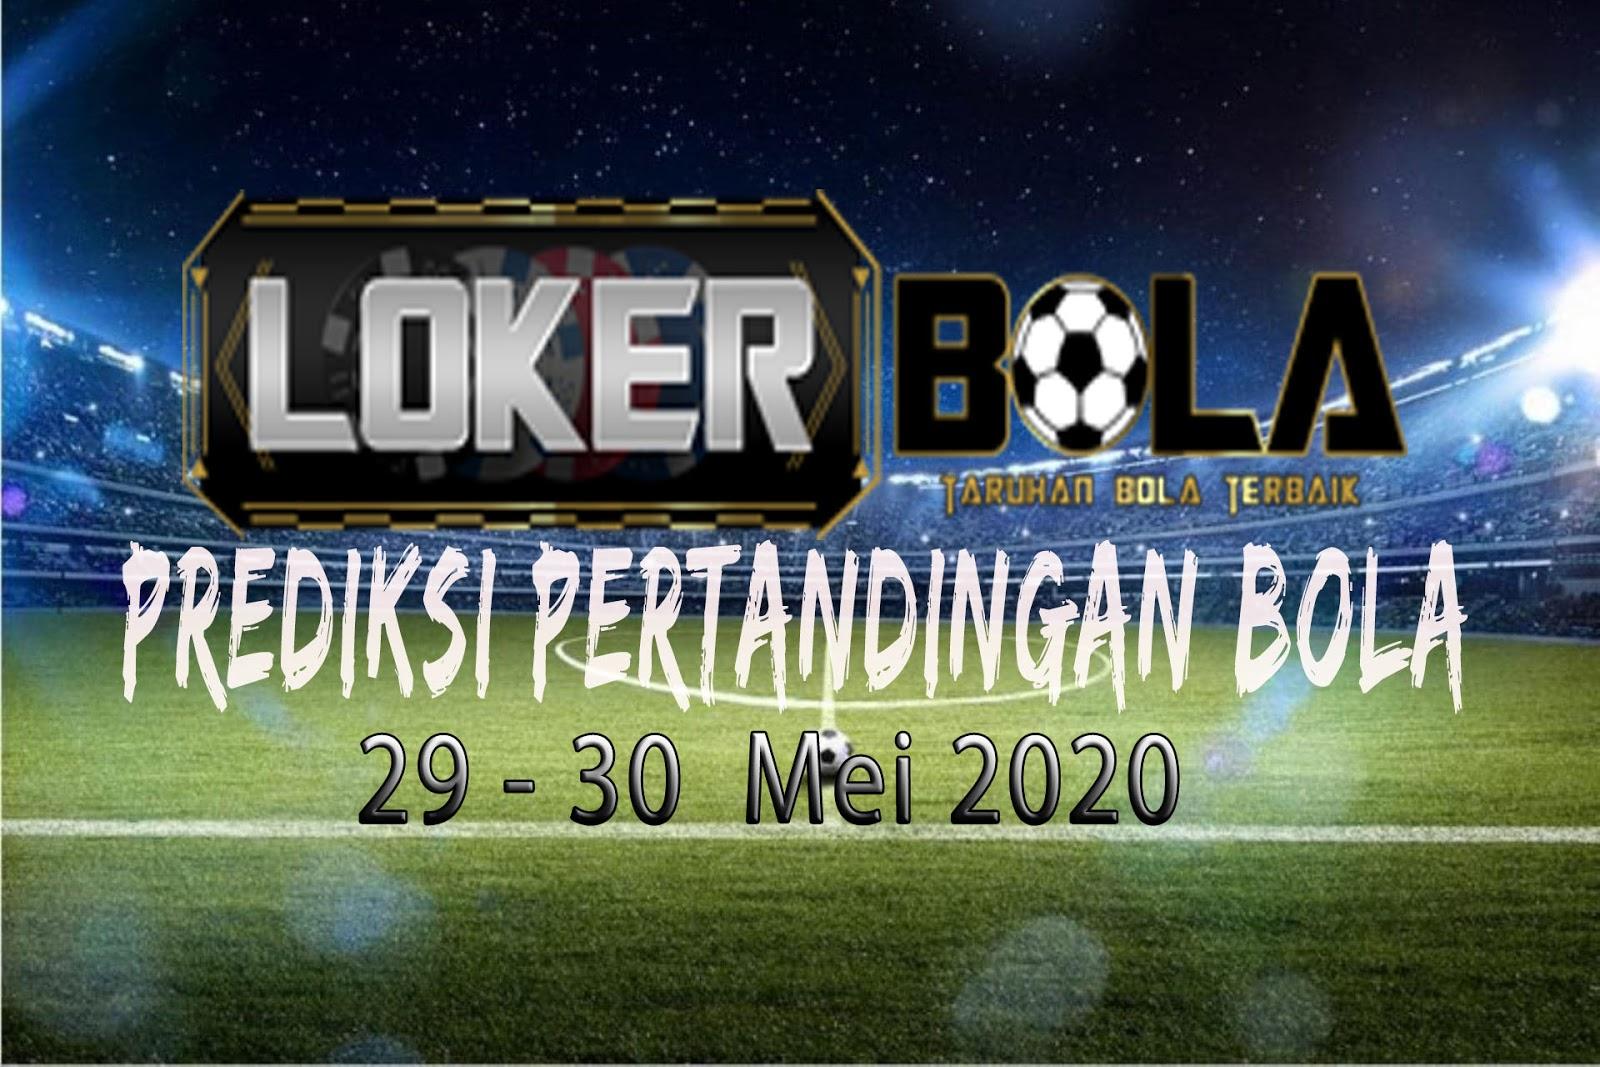 PREDIKSI PERTANDINGAN BOLA 29 – 30 May 2020